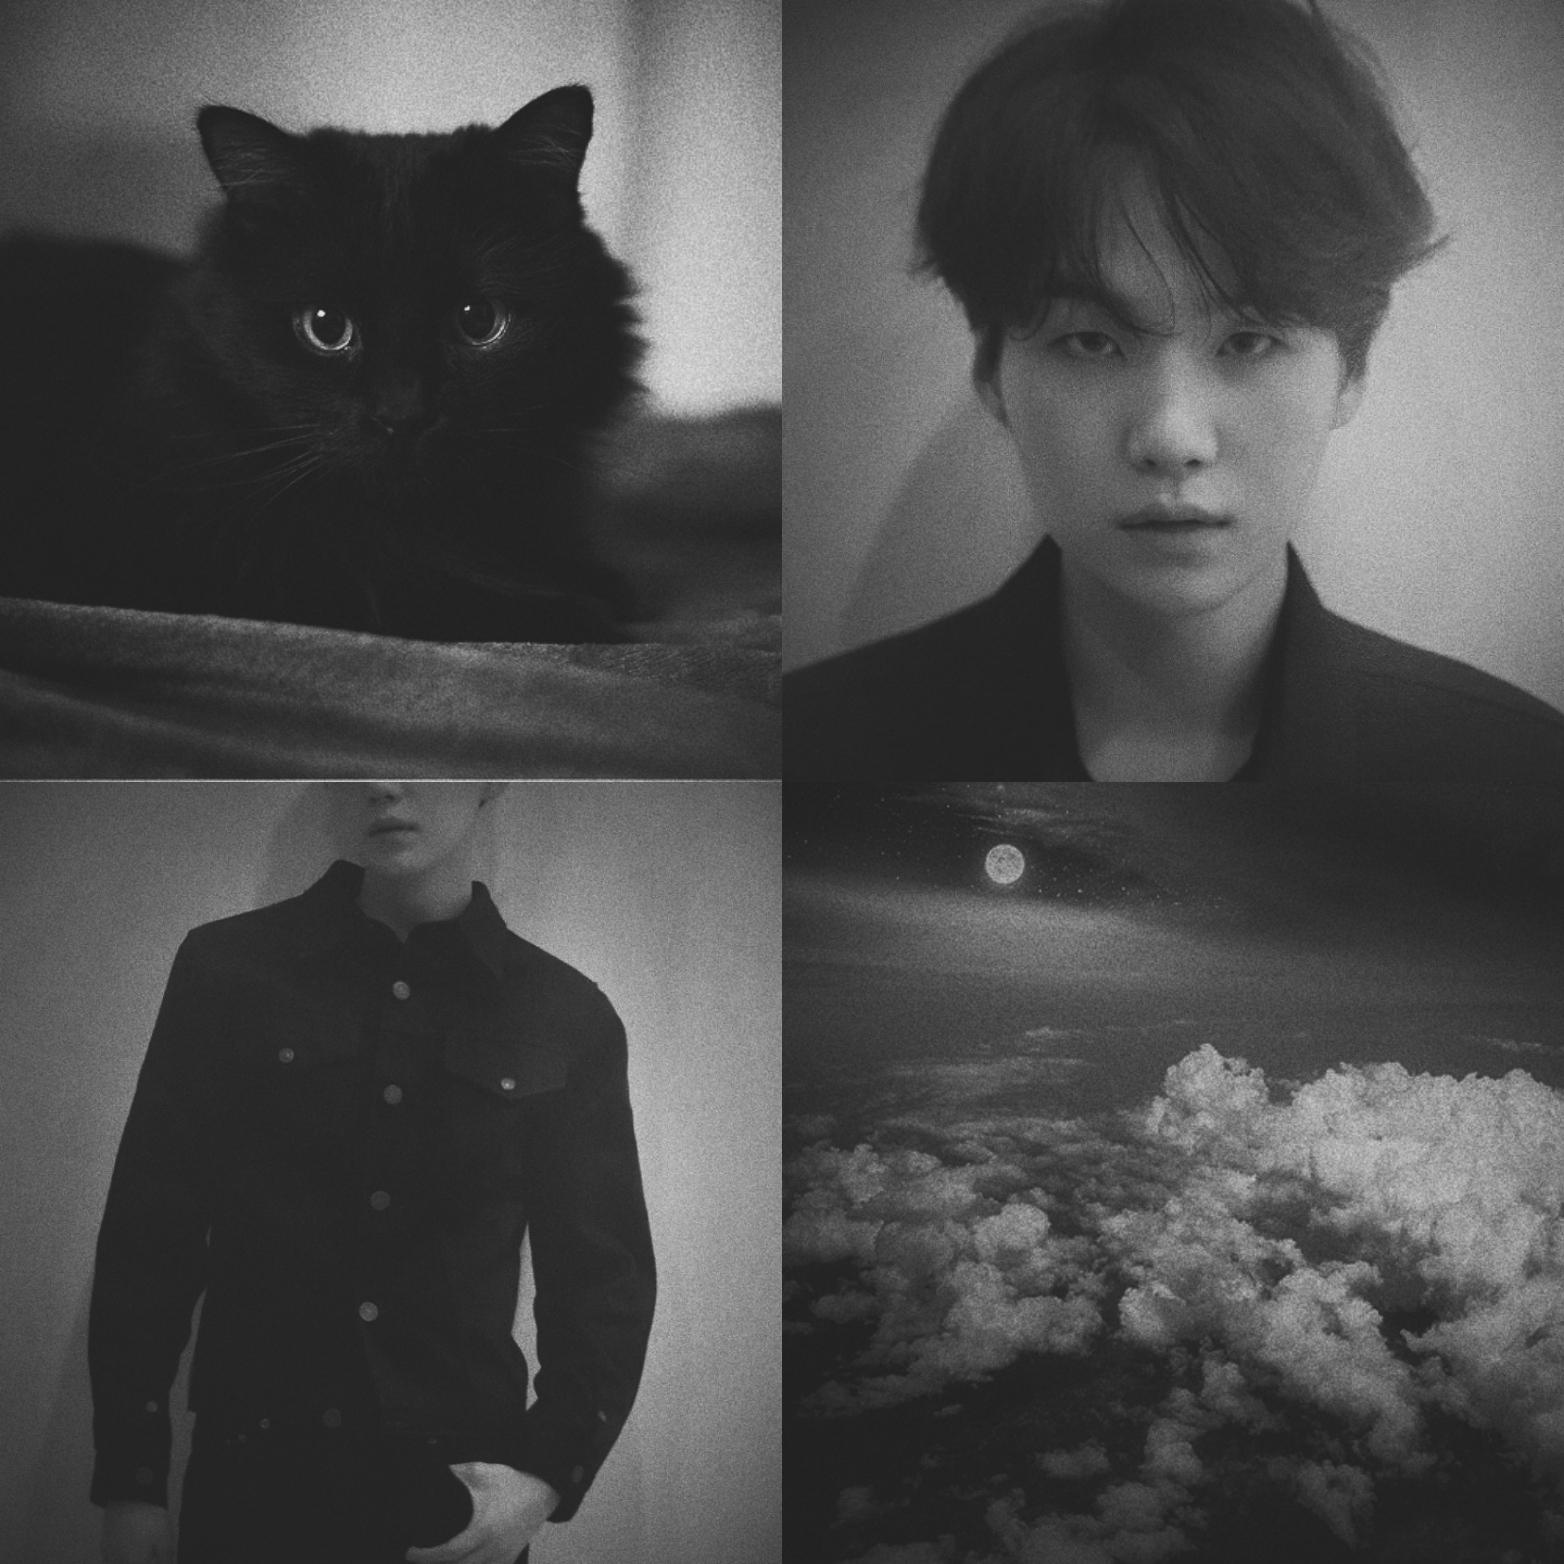 Min Yoongi B W Aesthetic Edit By Me Bts Minyoongi Greyscale Blackandwhite Cat Clouds Moon Yoonji Collages Vsco